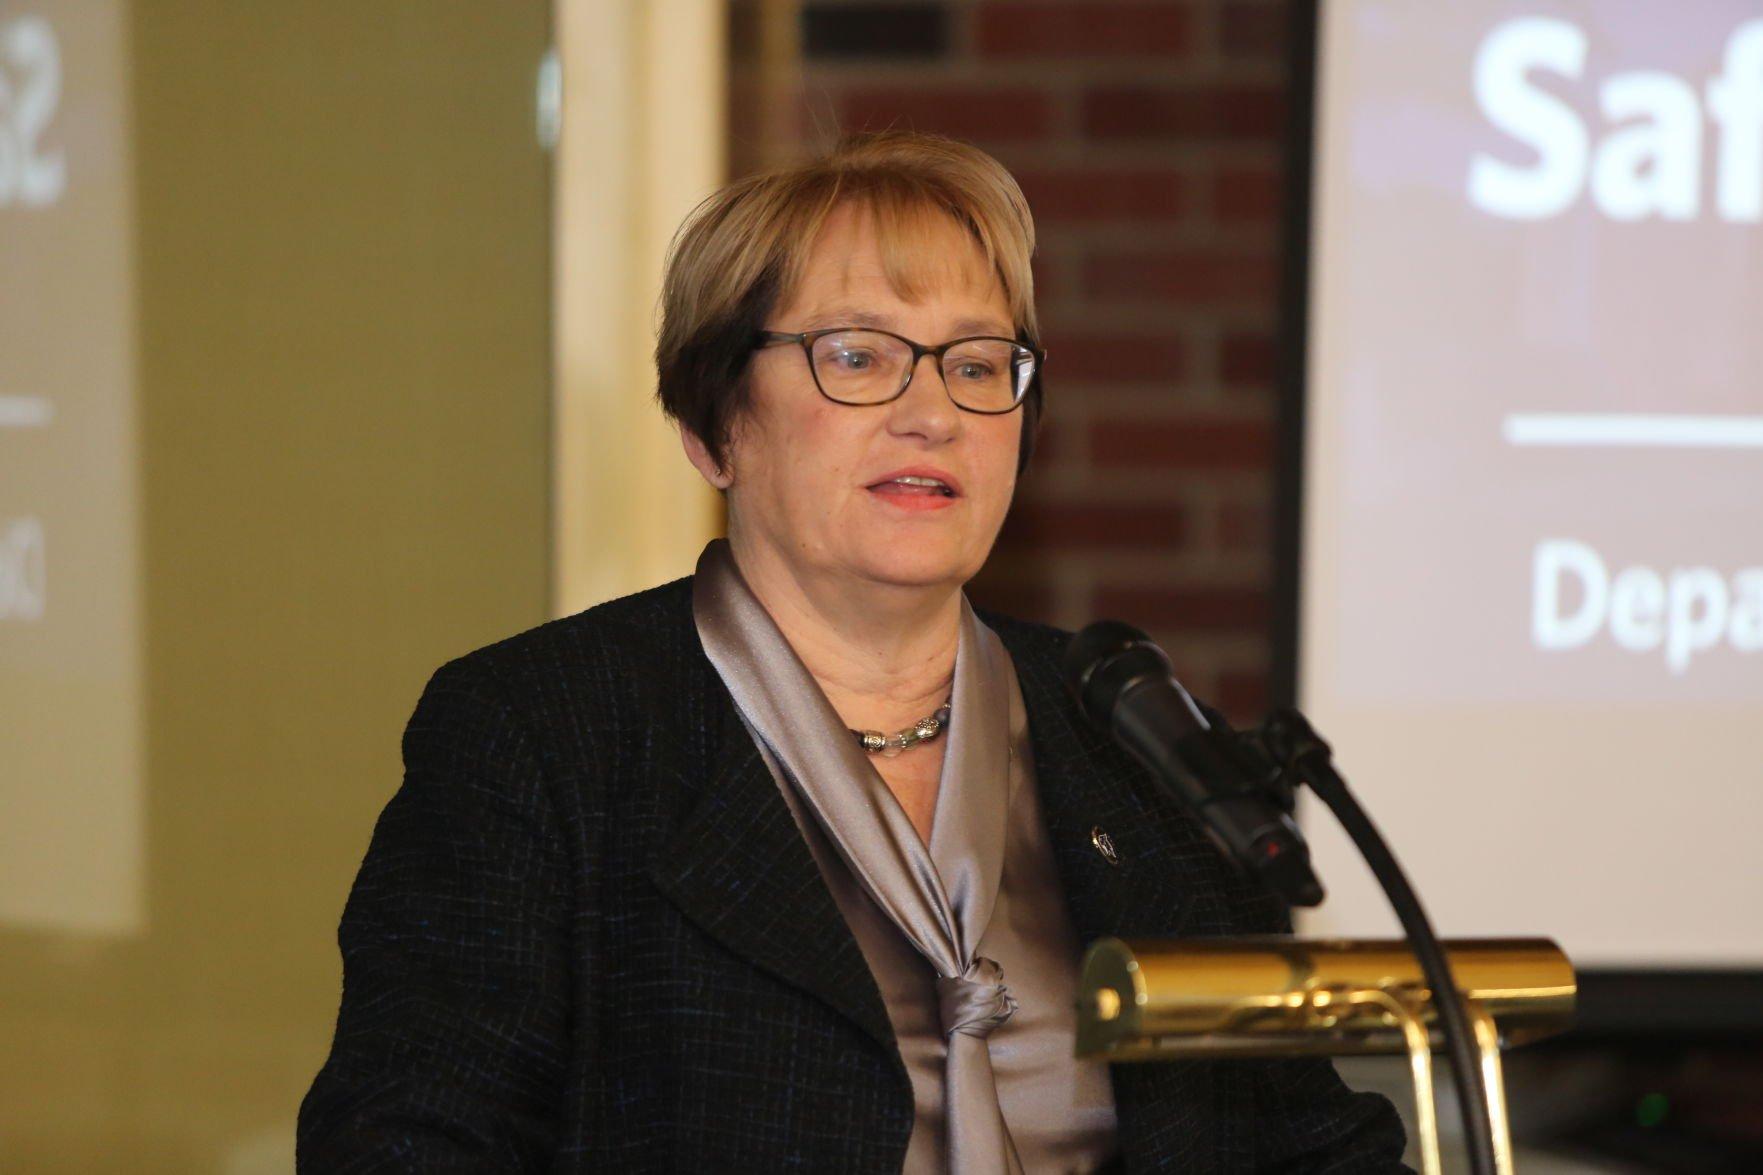 Susan Traverso